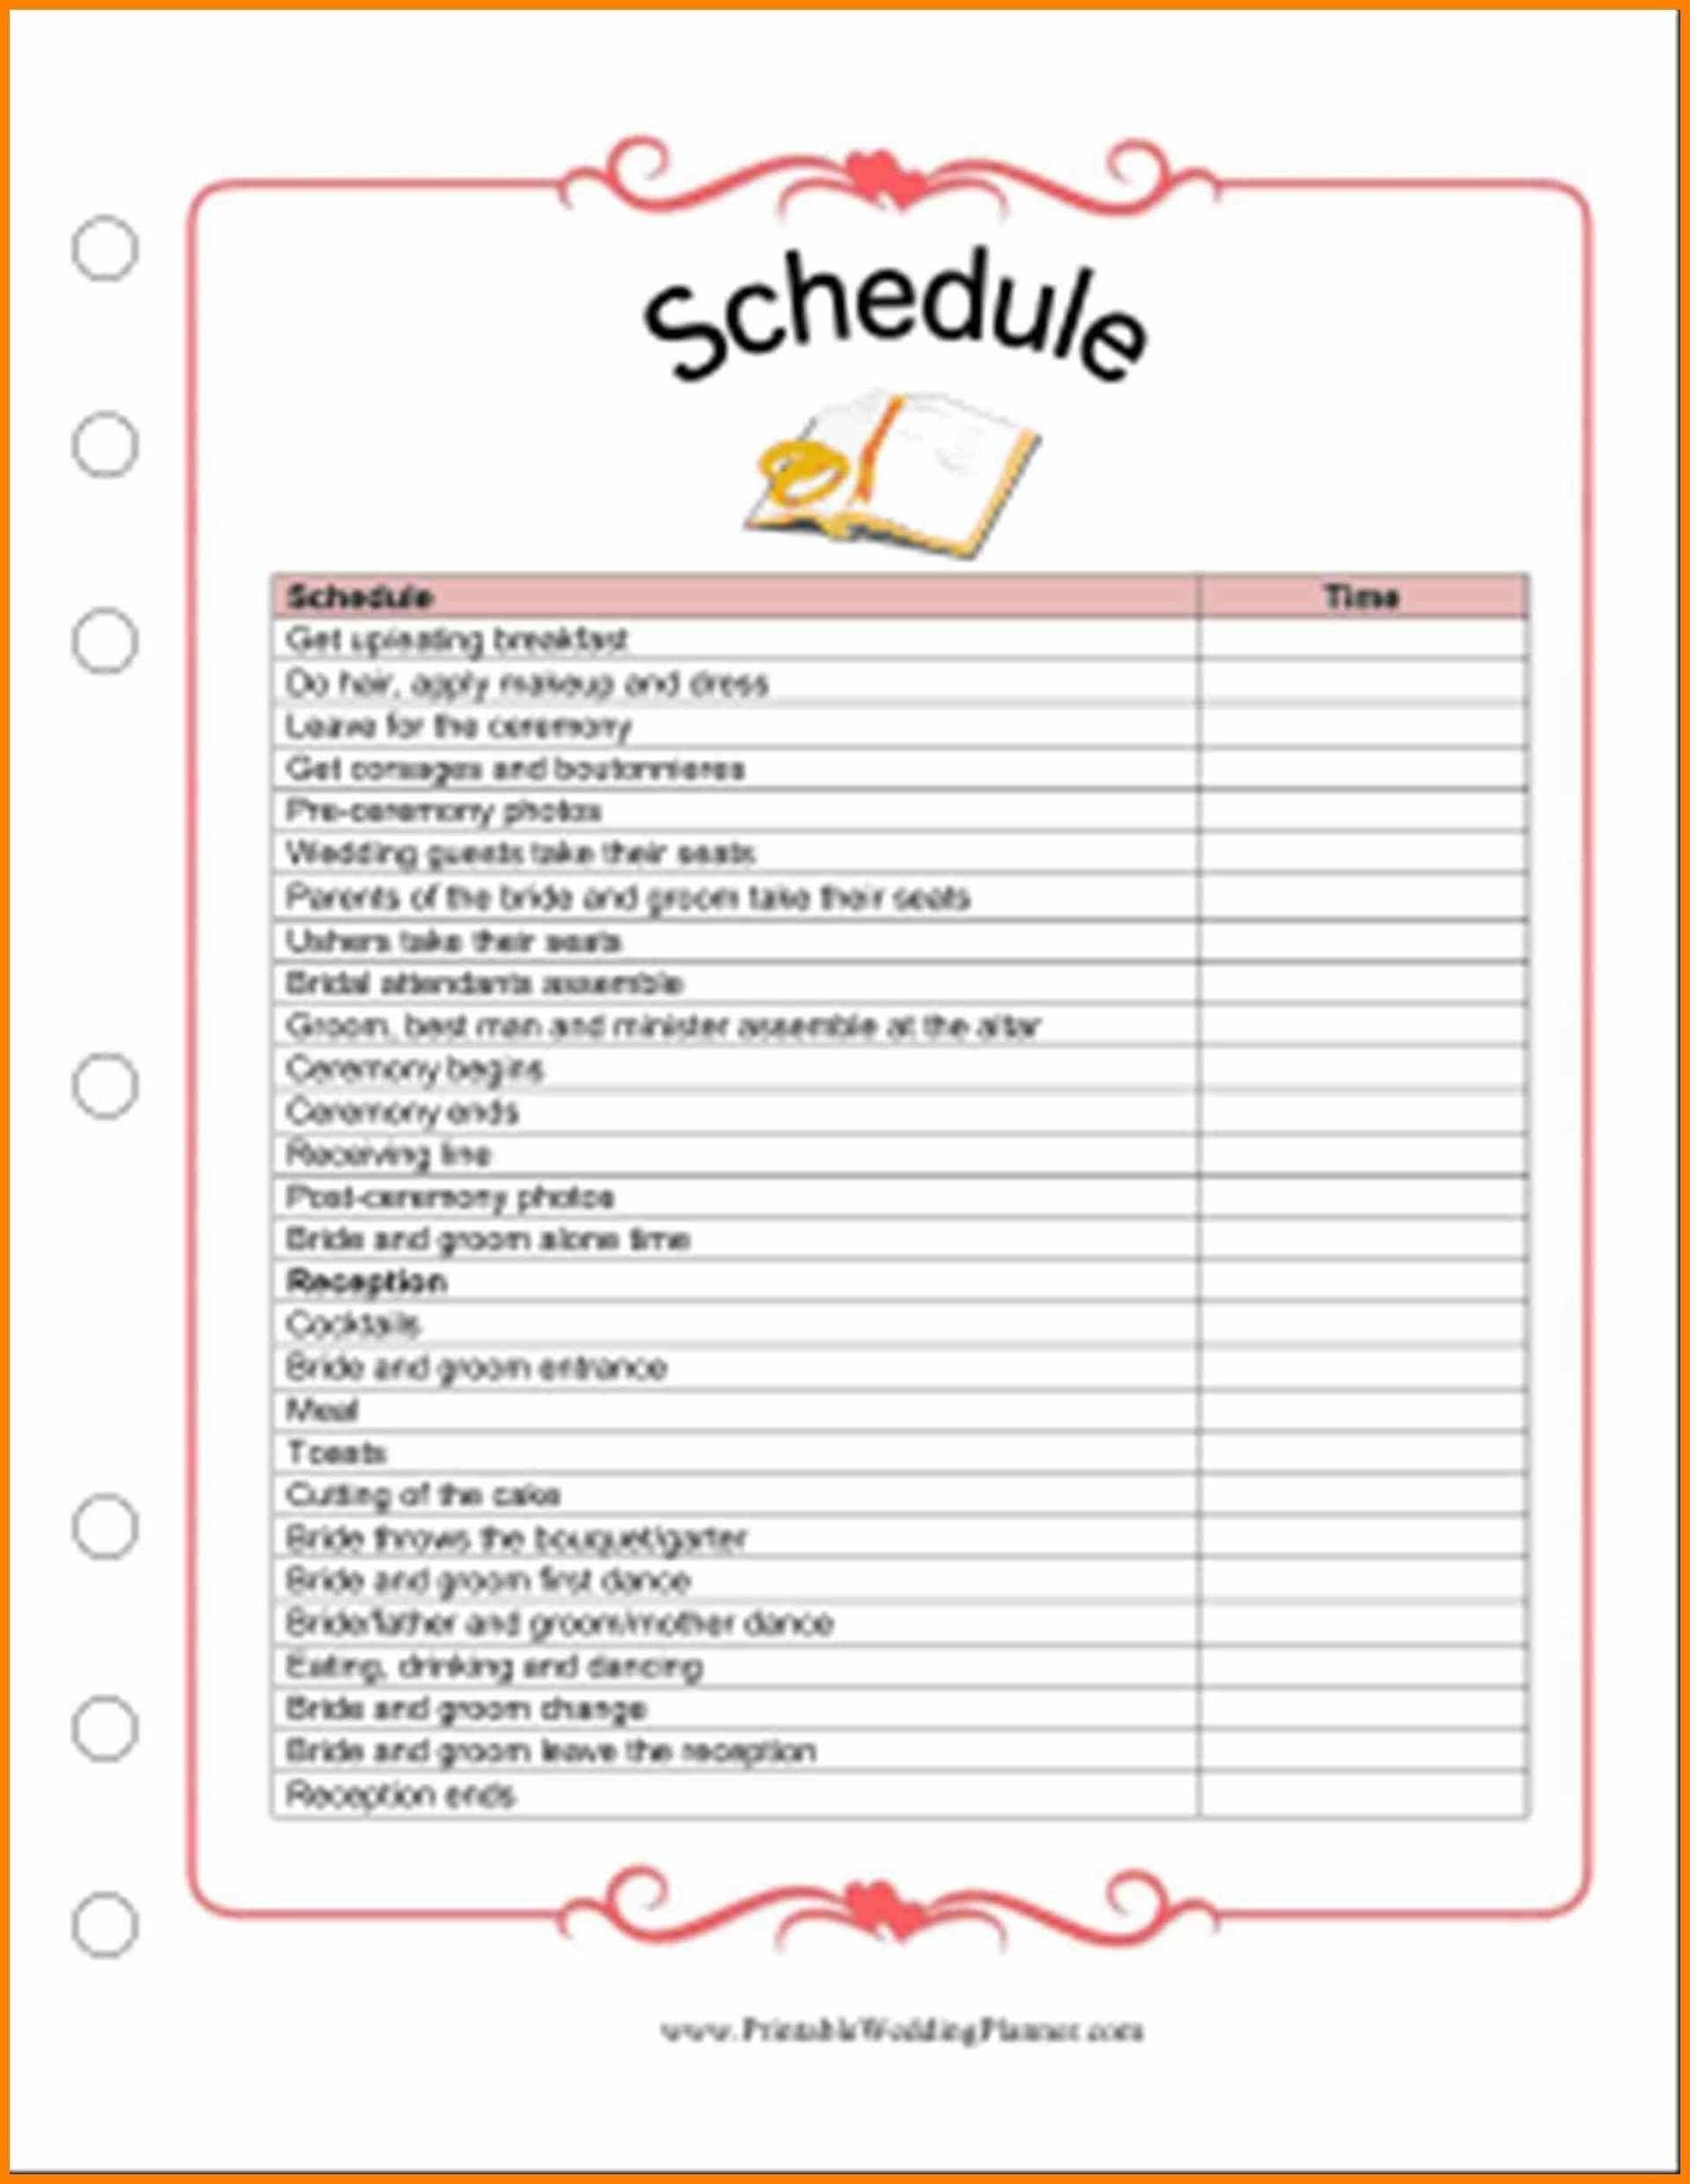 012 Template Ideas 3 Page Free Printable Wedding Binder Top - Free Printable Wedding Organizer Templates